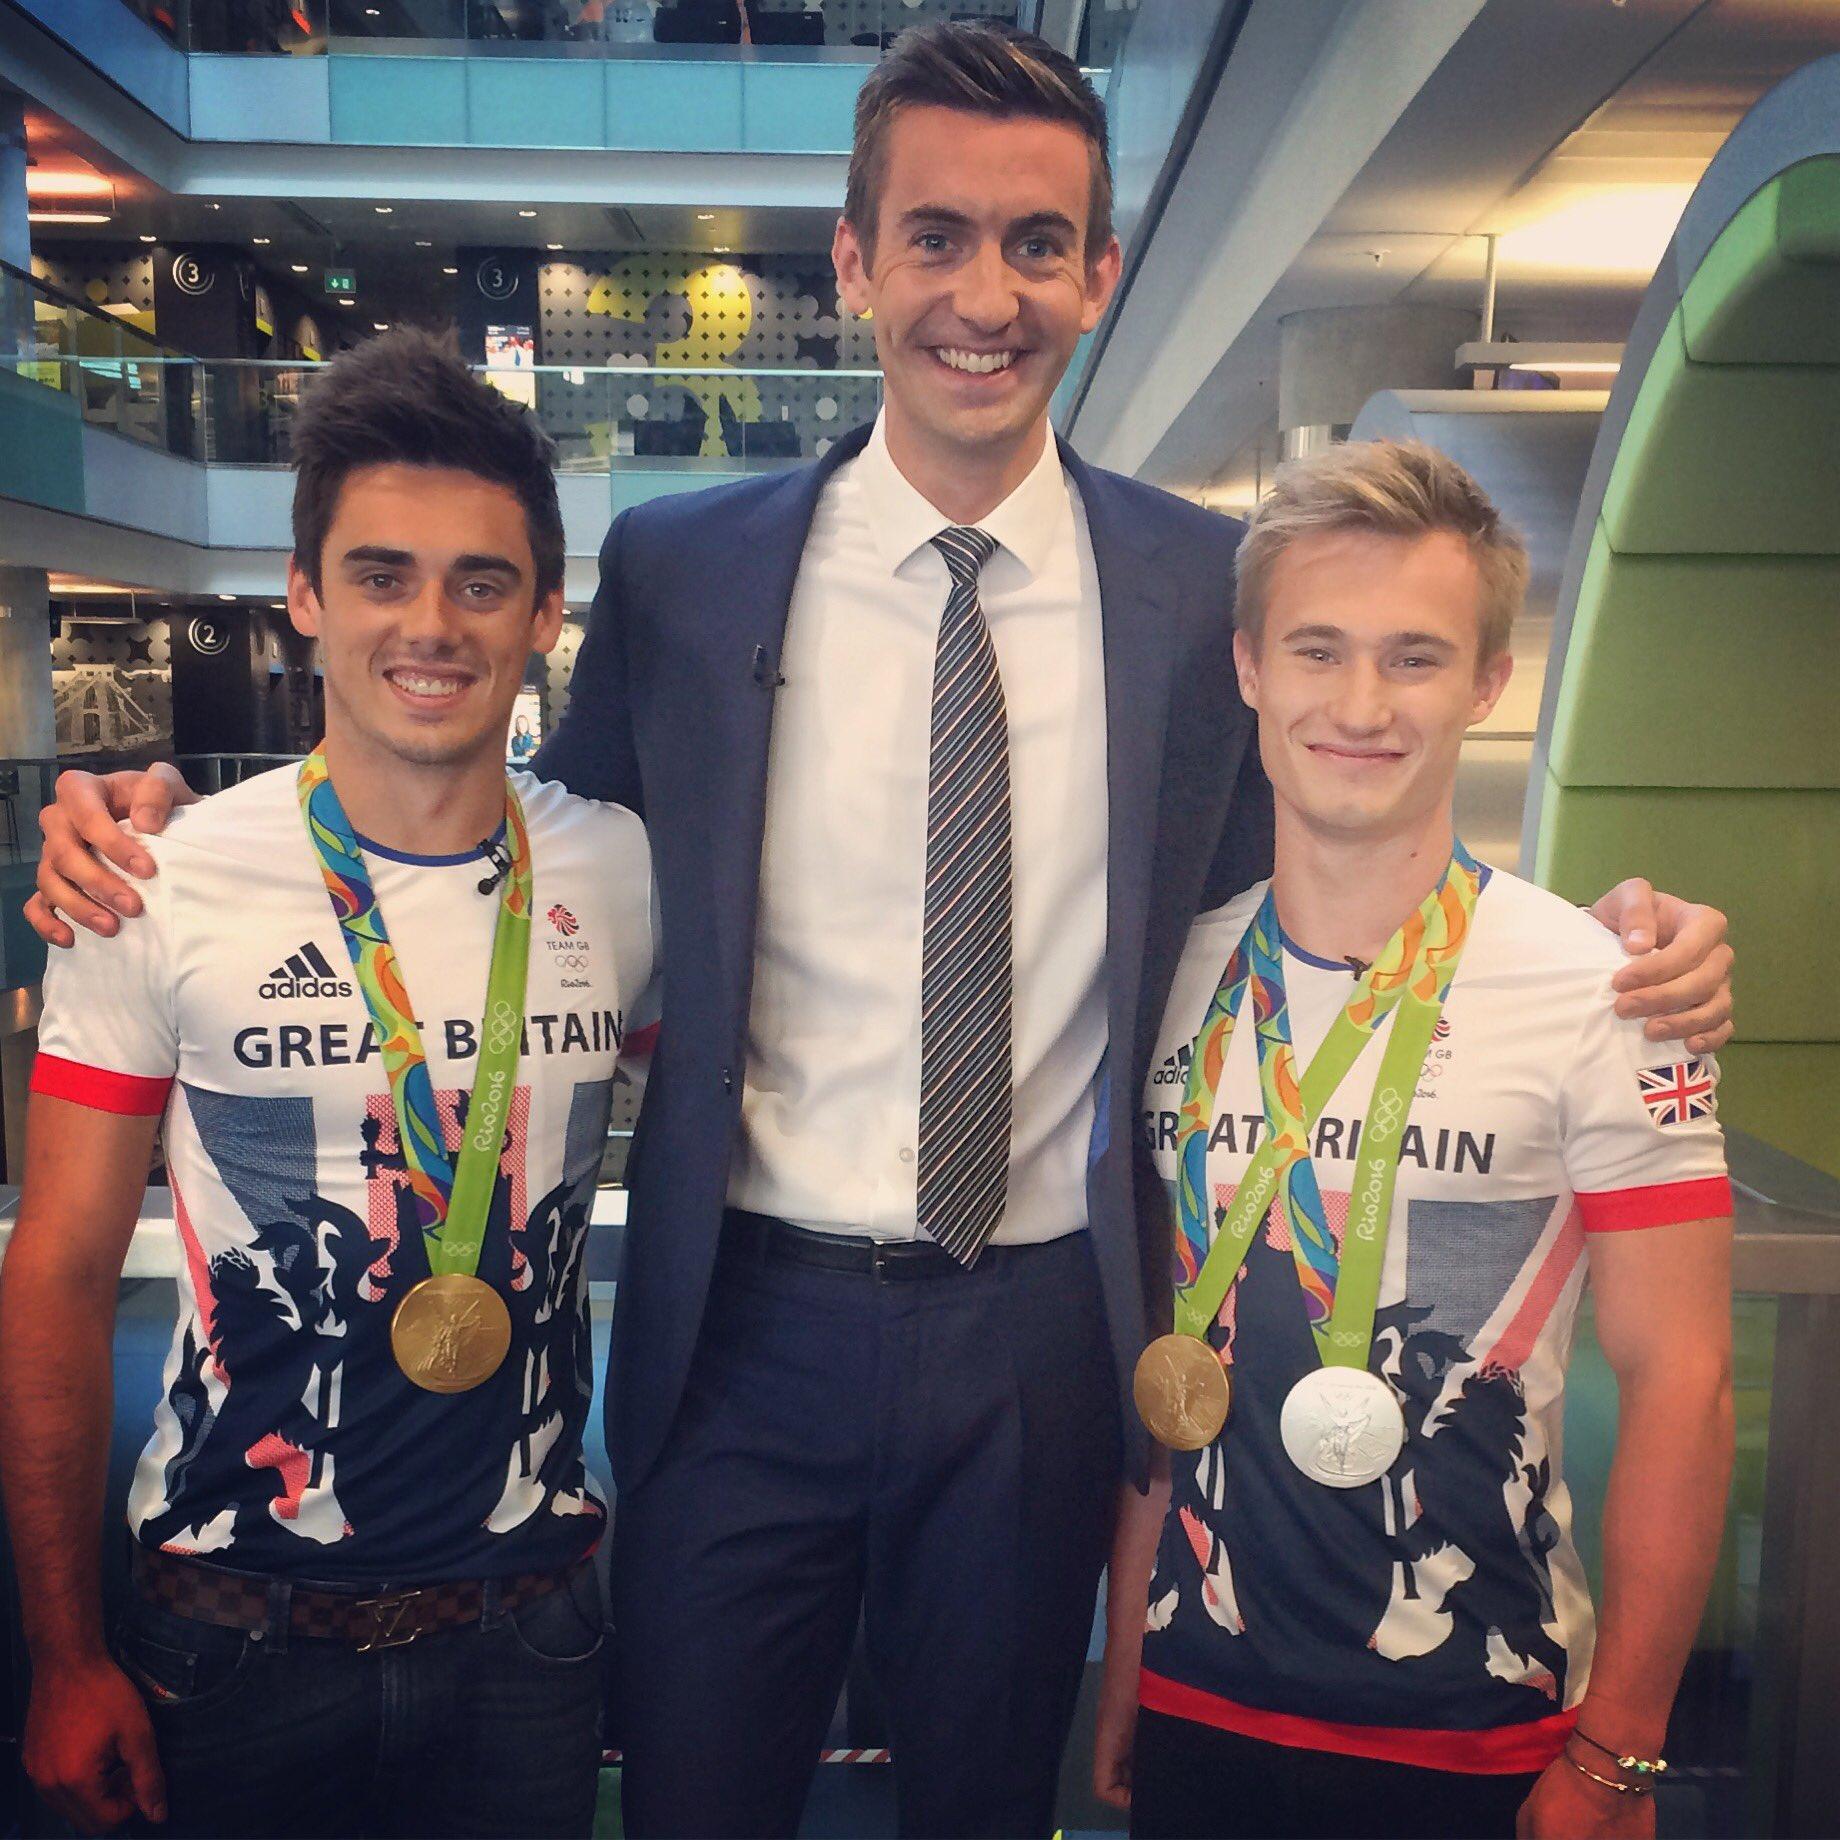 How tall is Ben Thompson on BBC Breakfast?